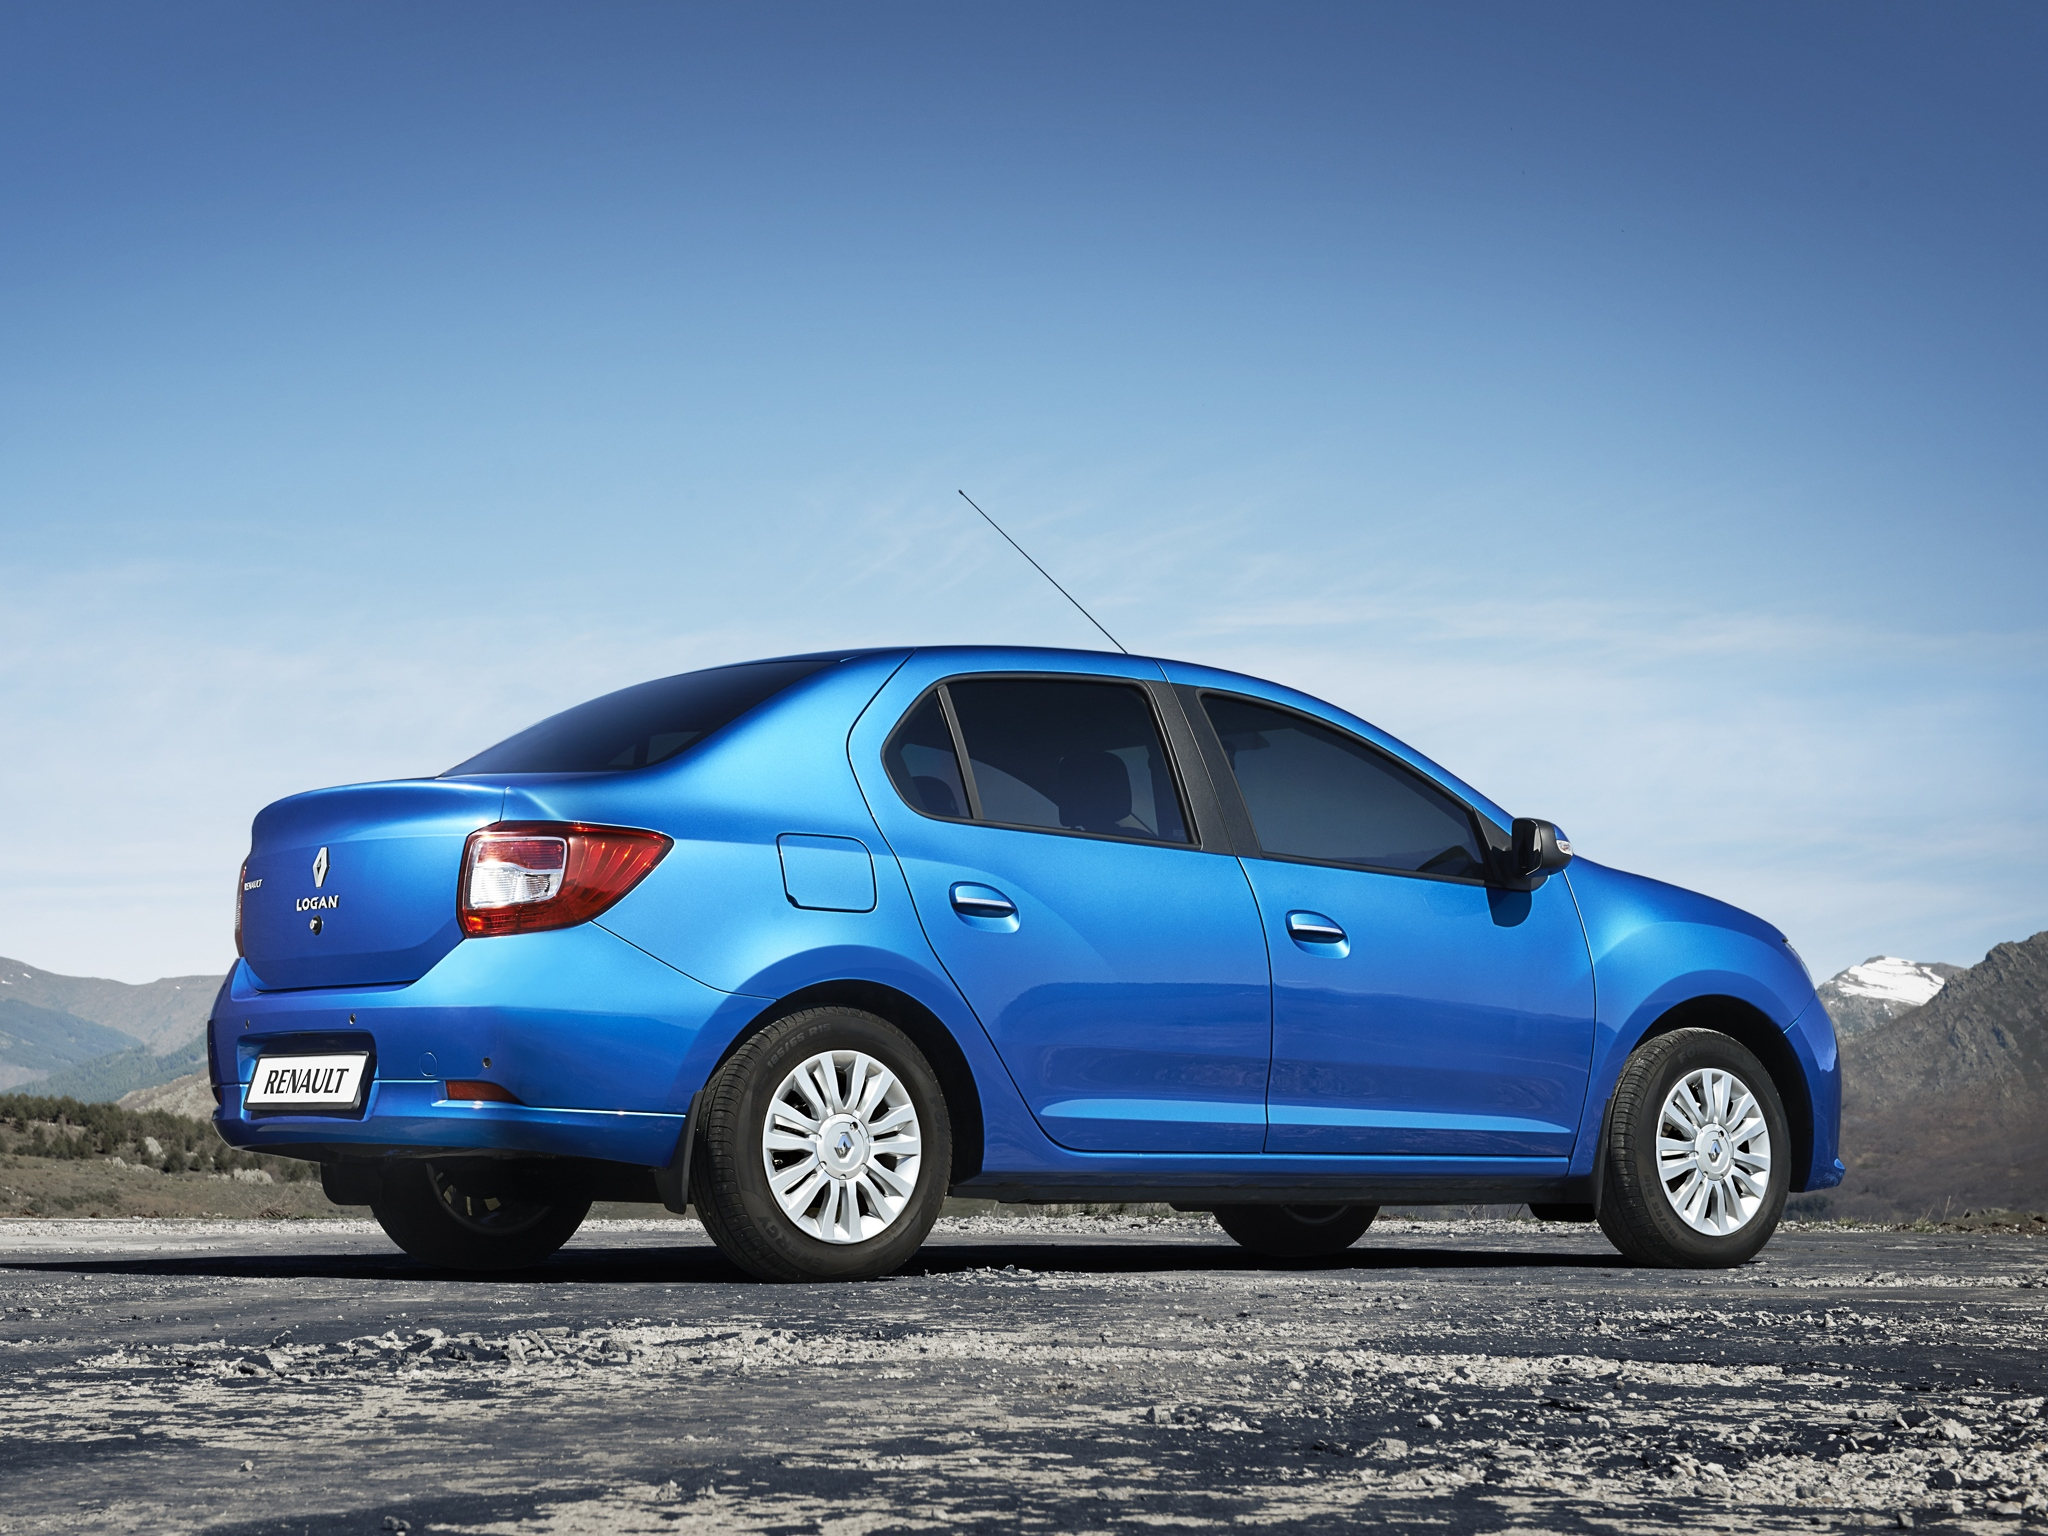 Renault Launches New Logan Sedan In Russia Full Details